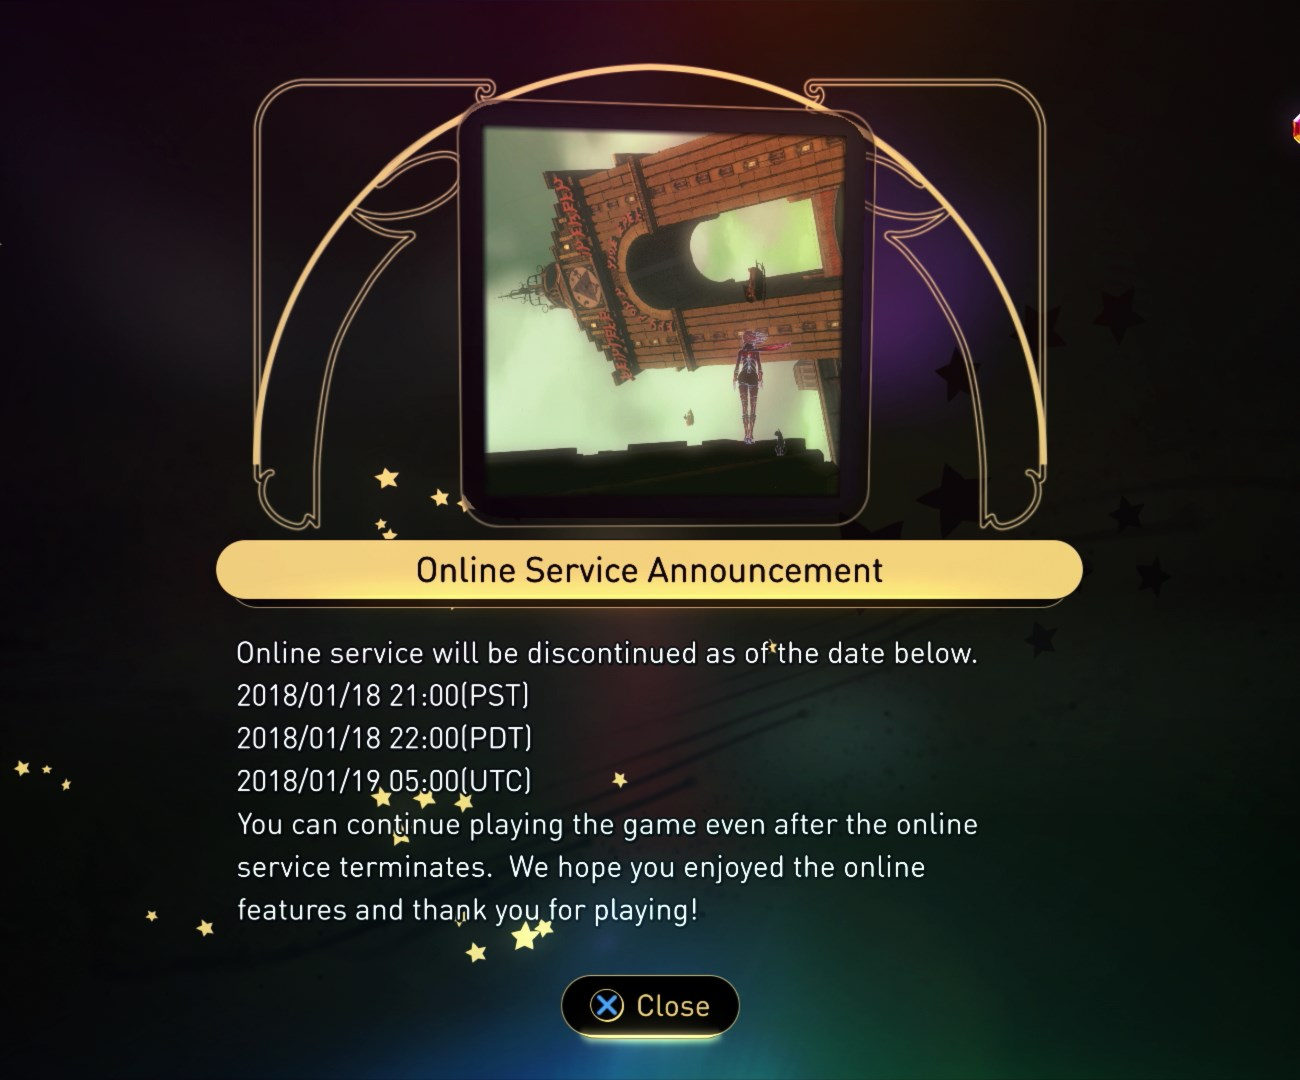 Gravity Rush 2 - Online Service Announcement